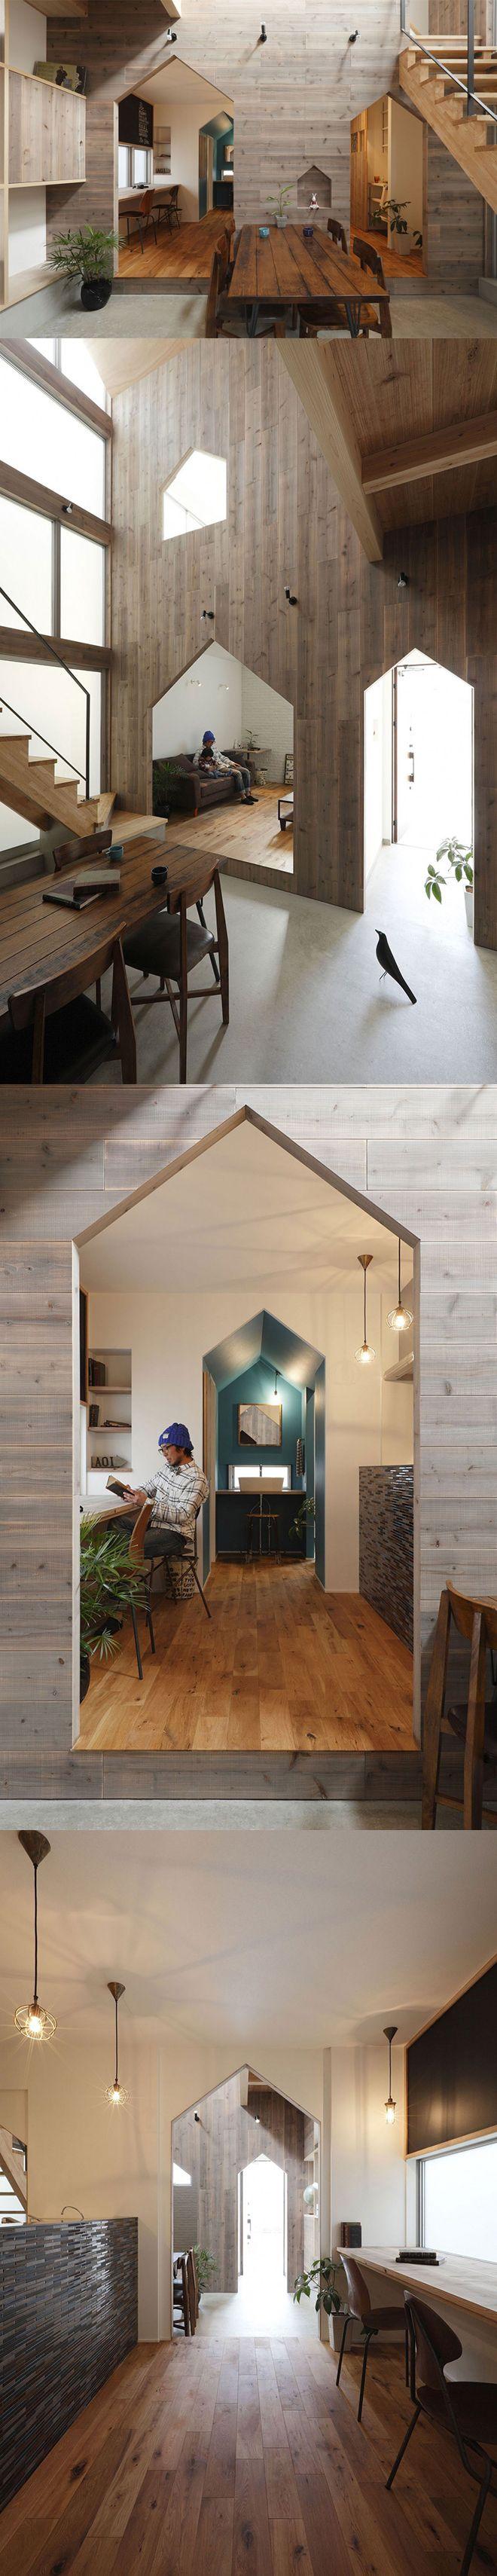 Hazukashi house in city of kyoto architects alts design office